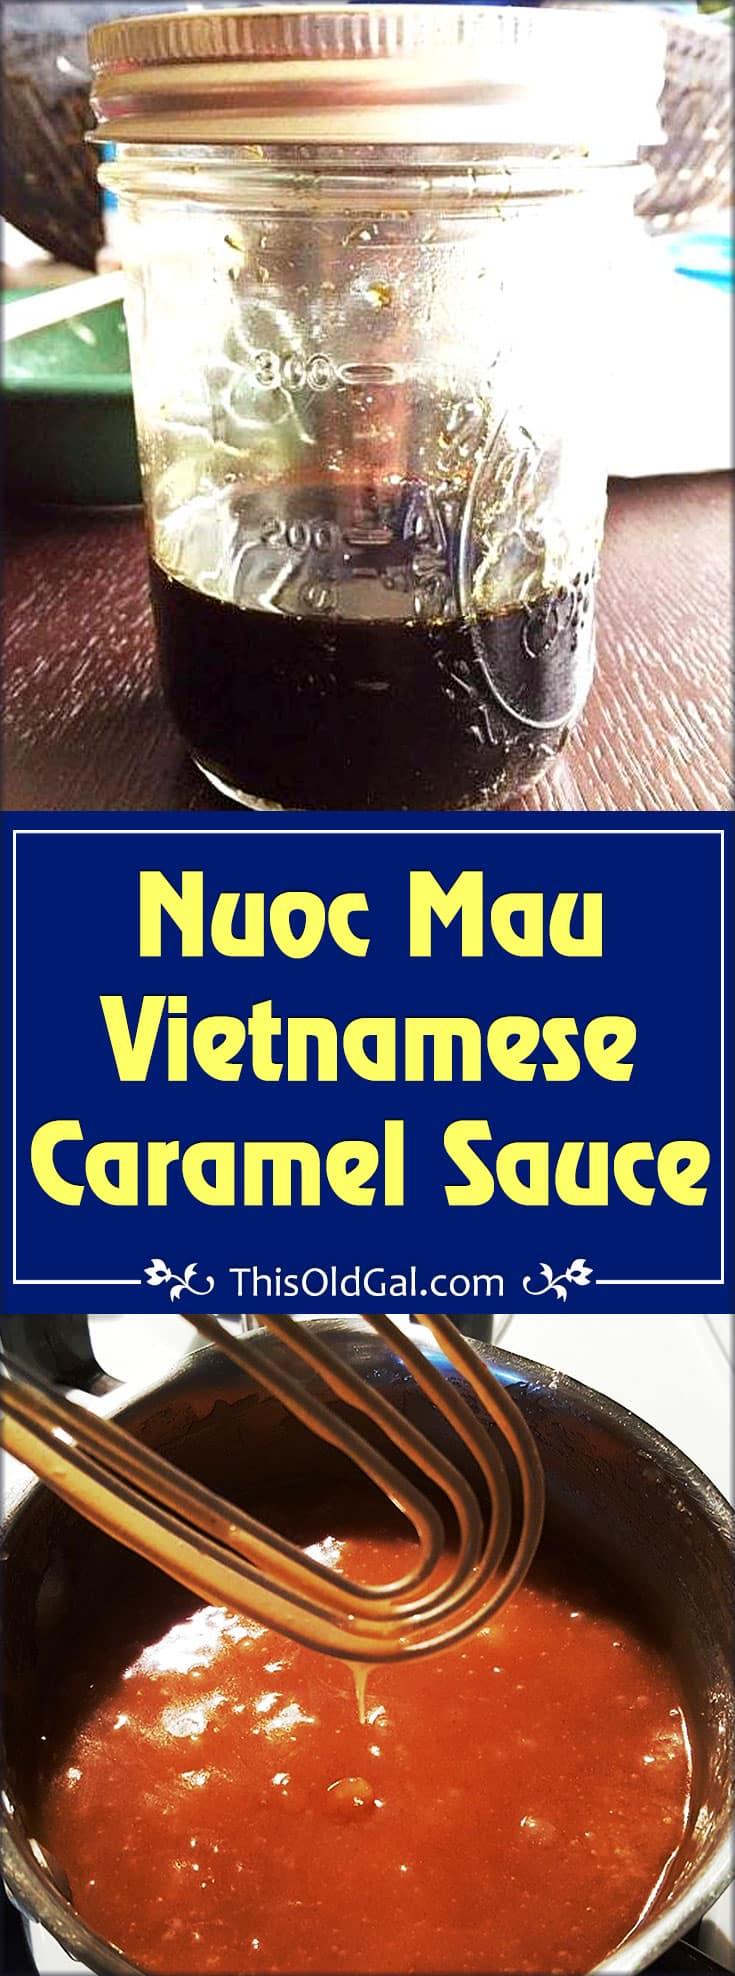 Nuoc Mau Vietnamese Caramel Sauce